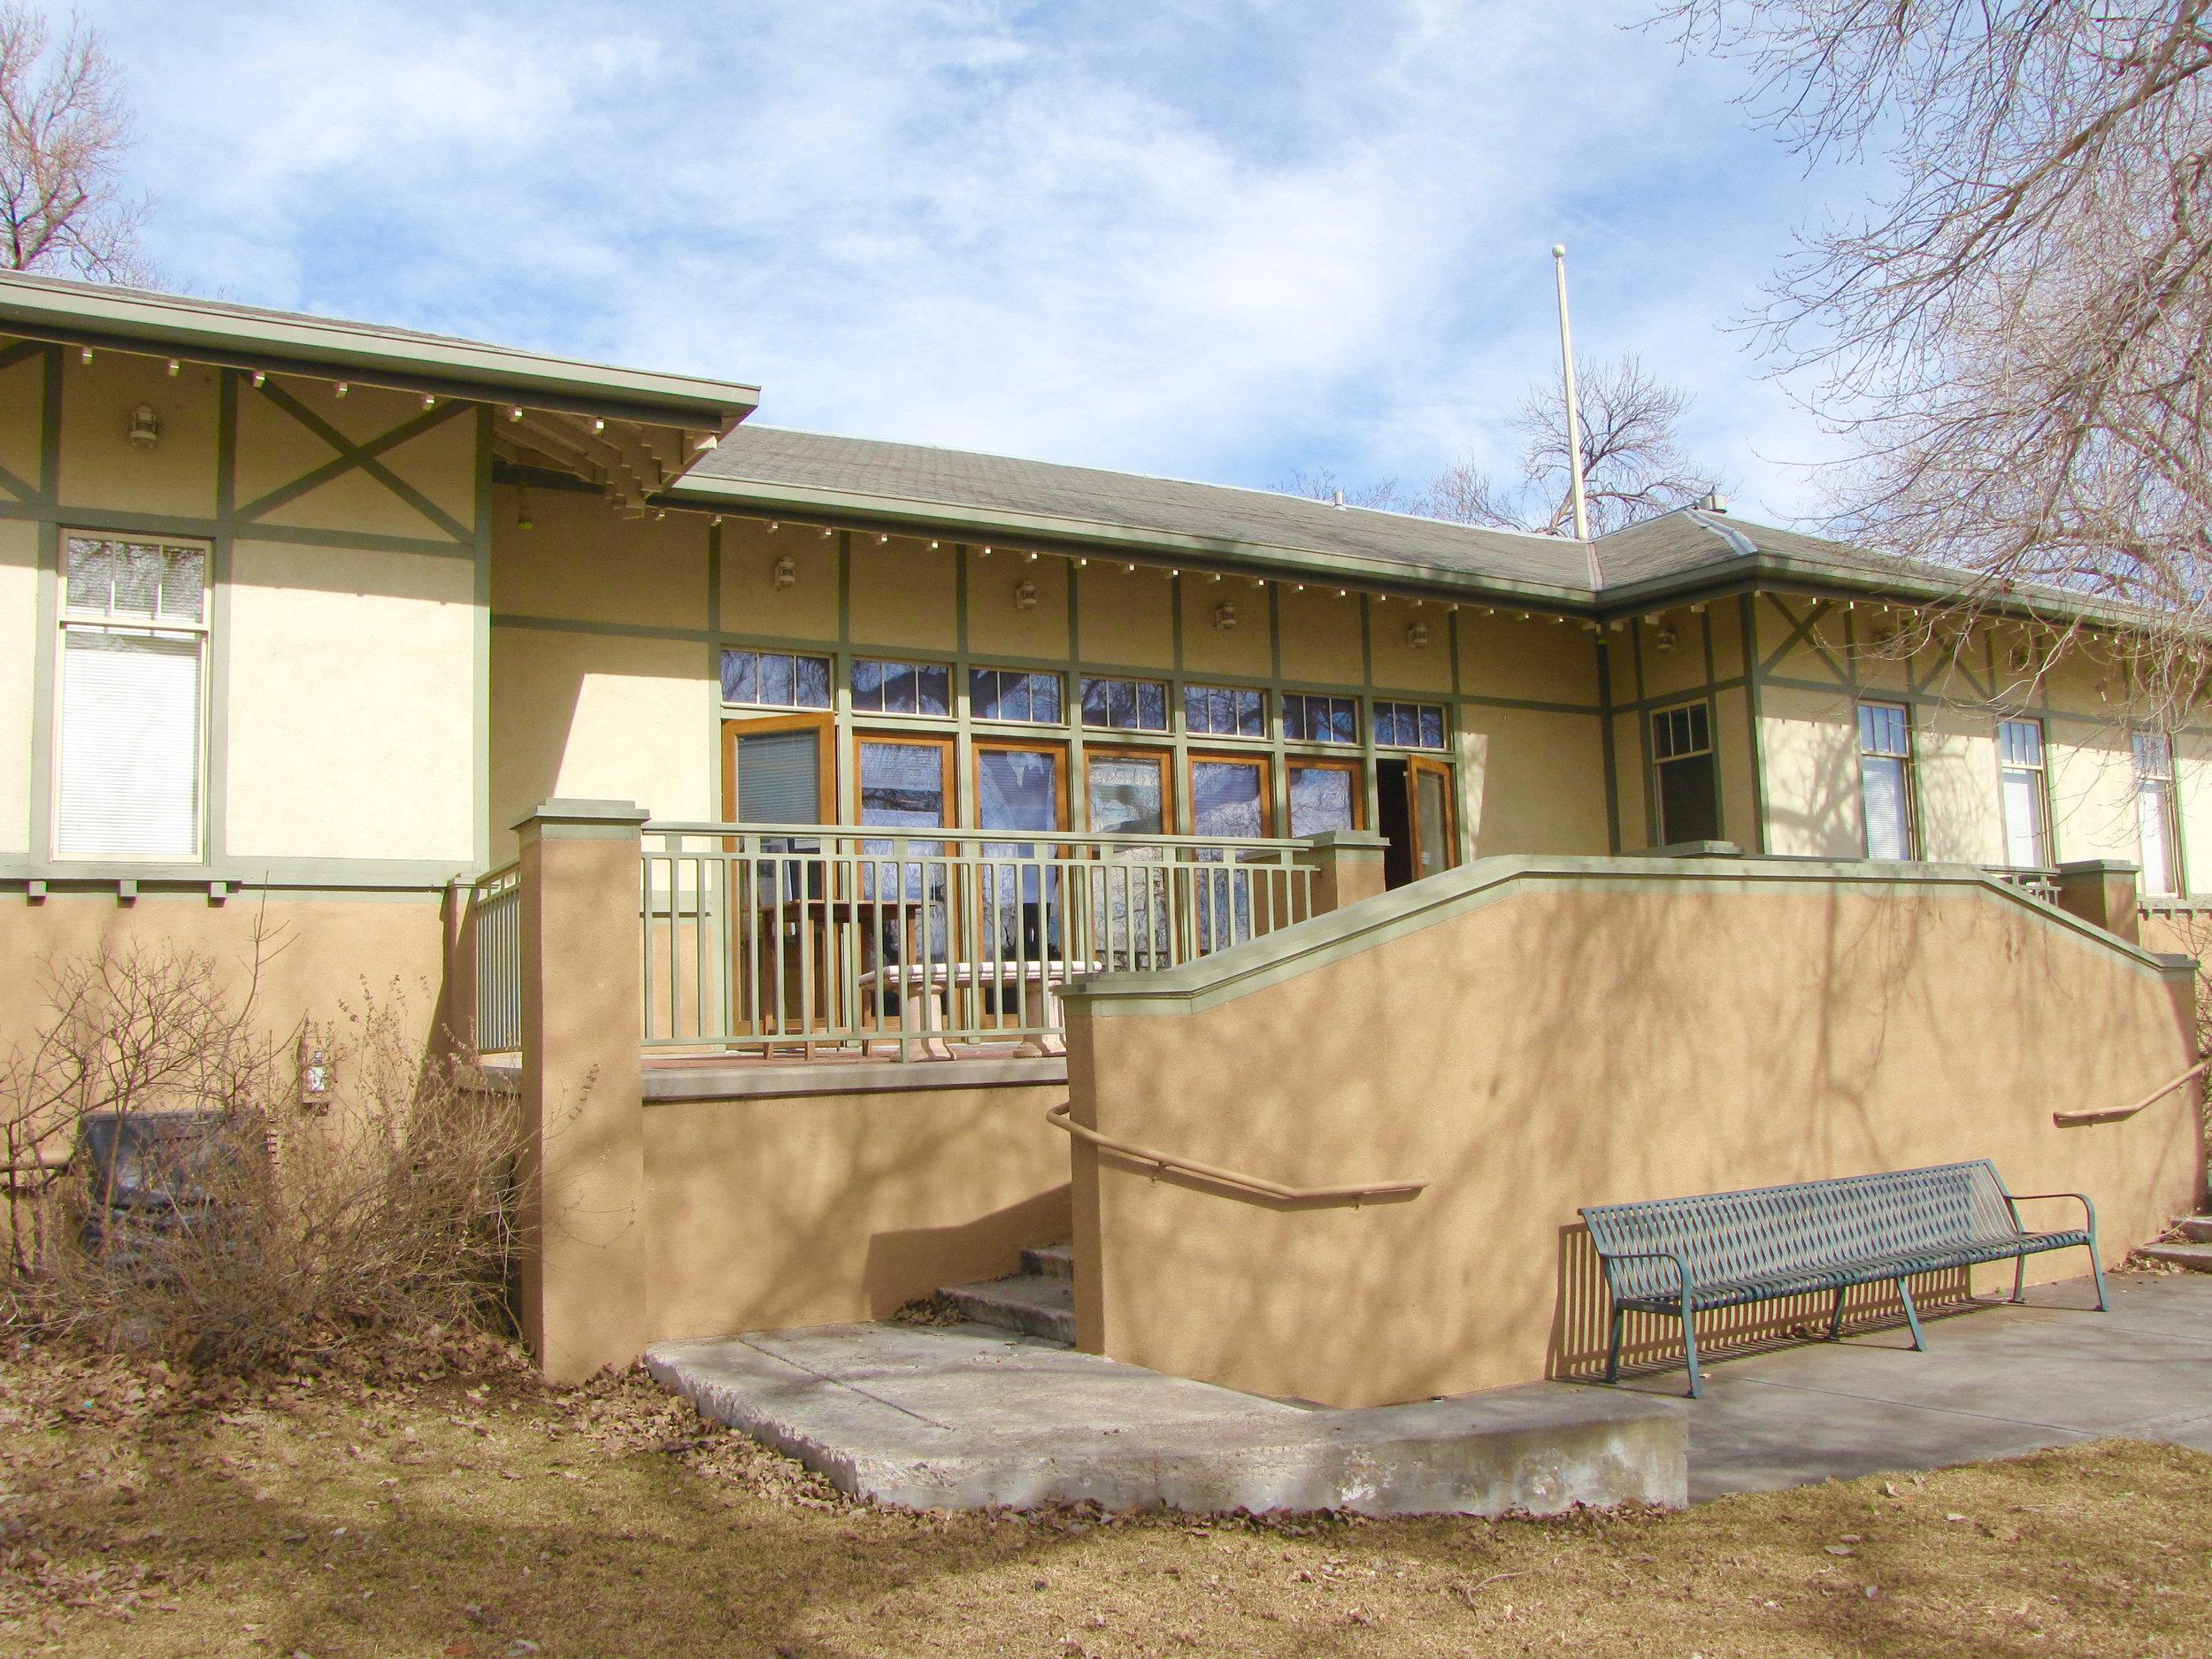 Dos Chappell Bathhouse at Smith Lake-Washington Park, Denver